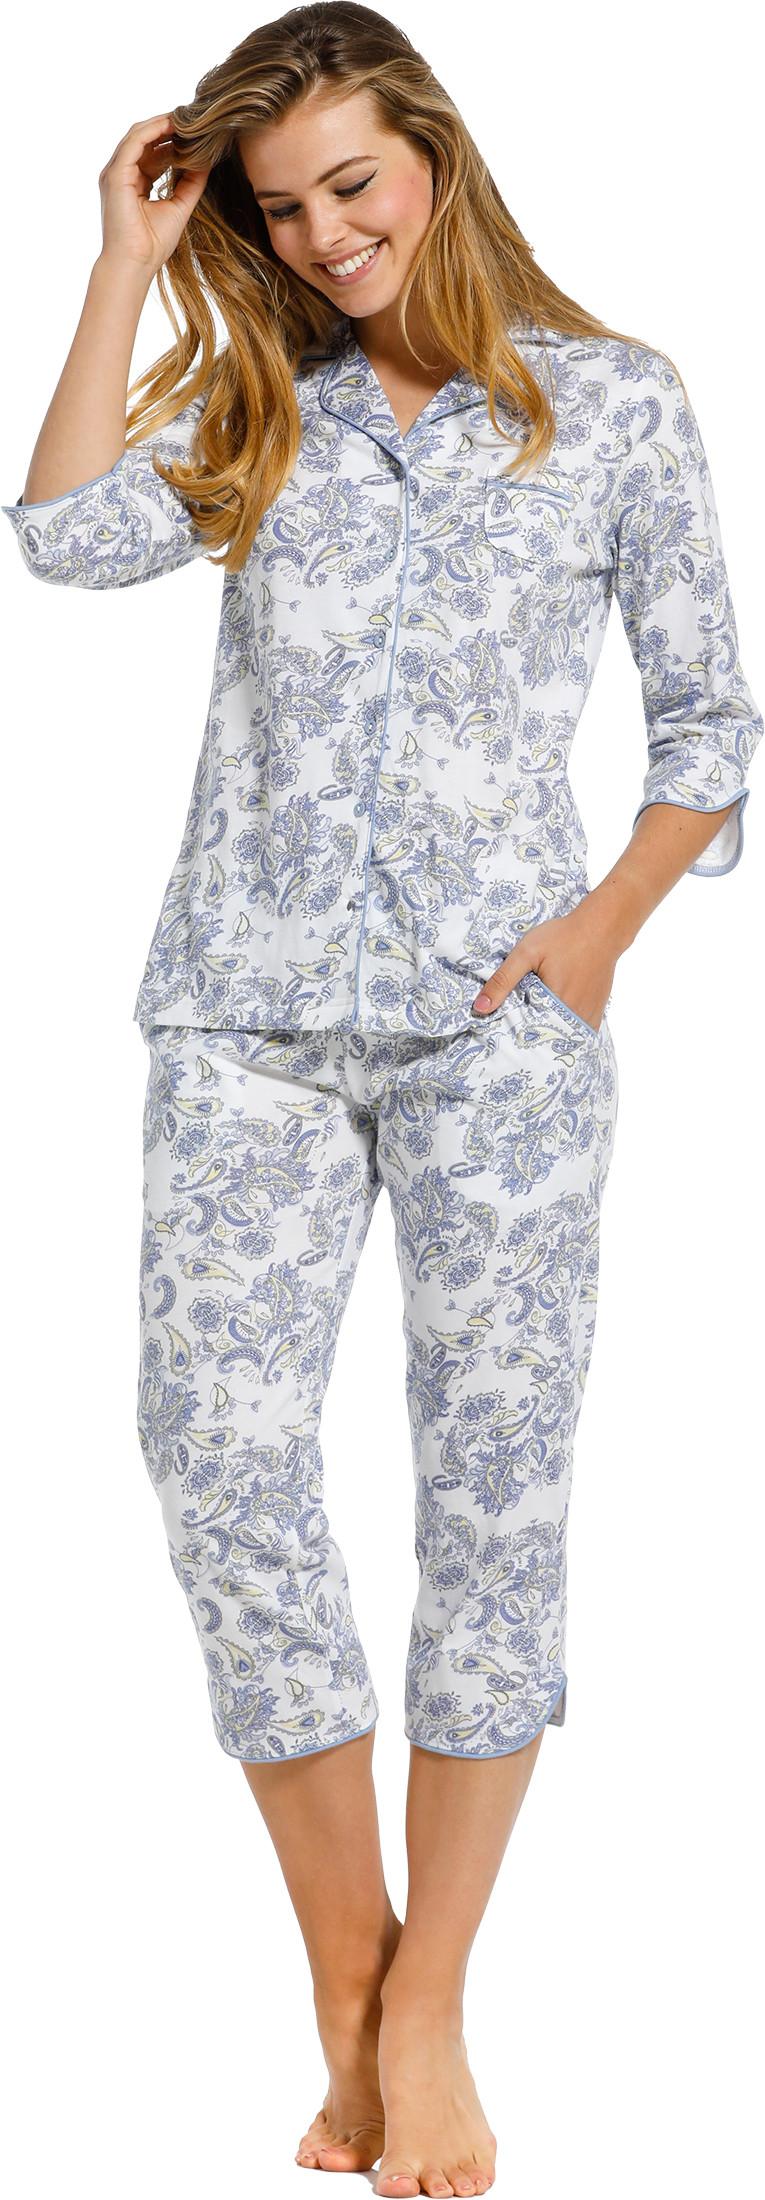 Dames pyjama Pastunette 20211-110-6-40